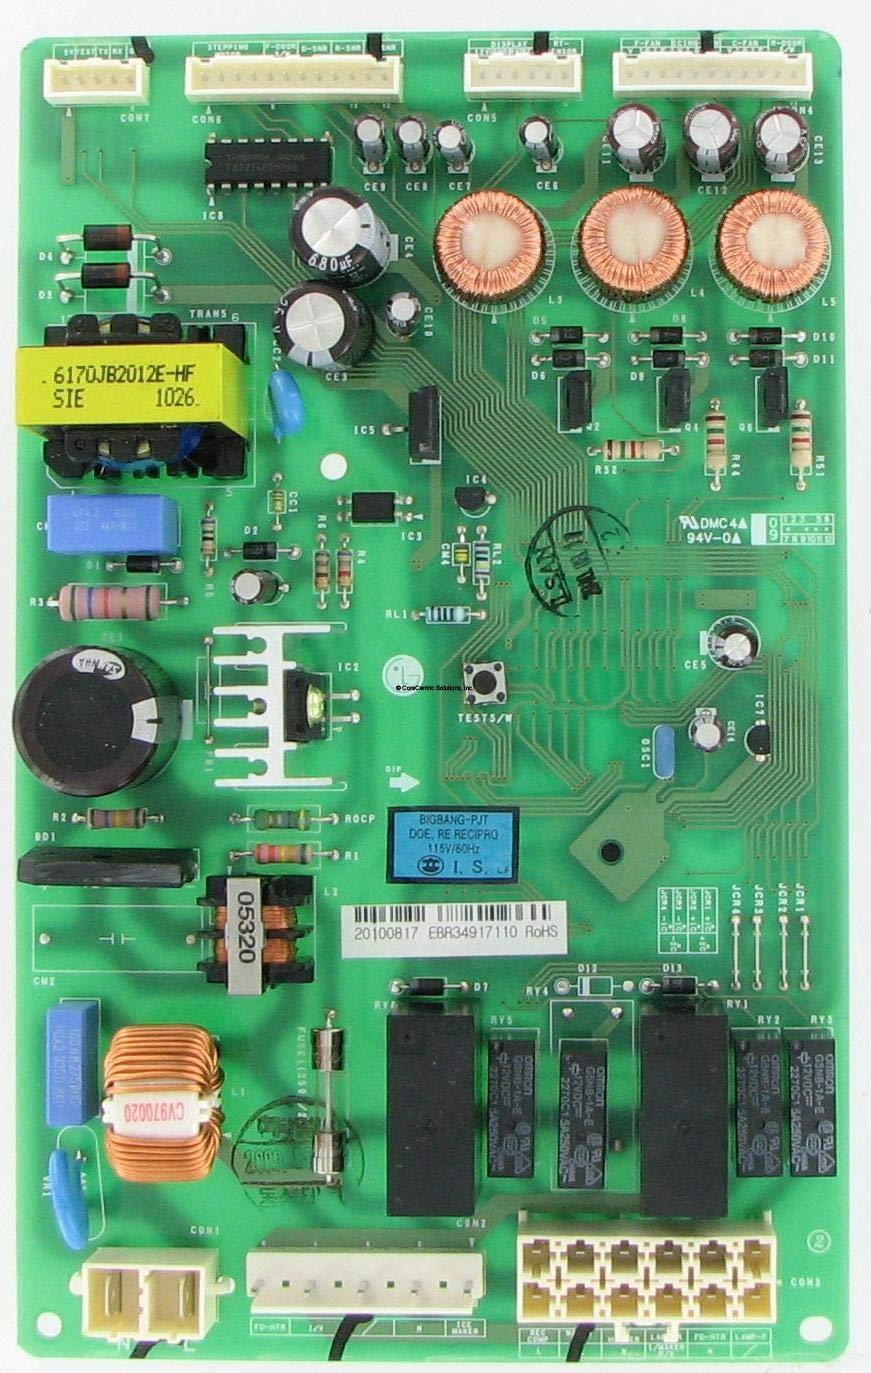 LG EBR34917110 Refrigerator Electronic Control Board (Renewed)